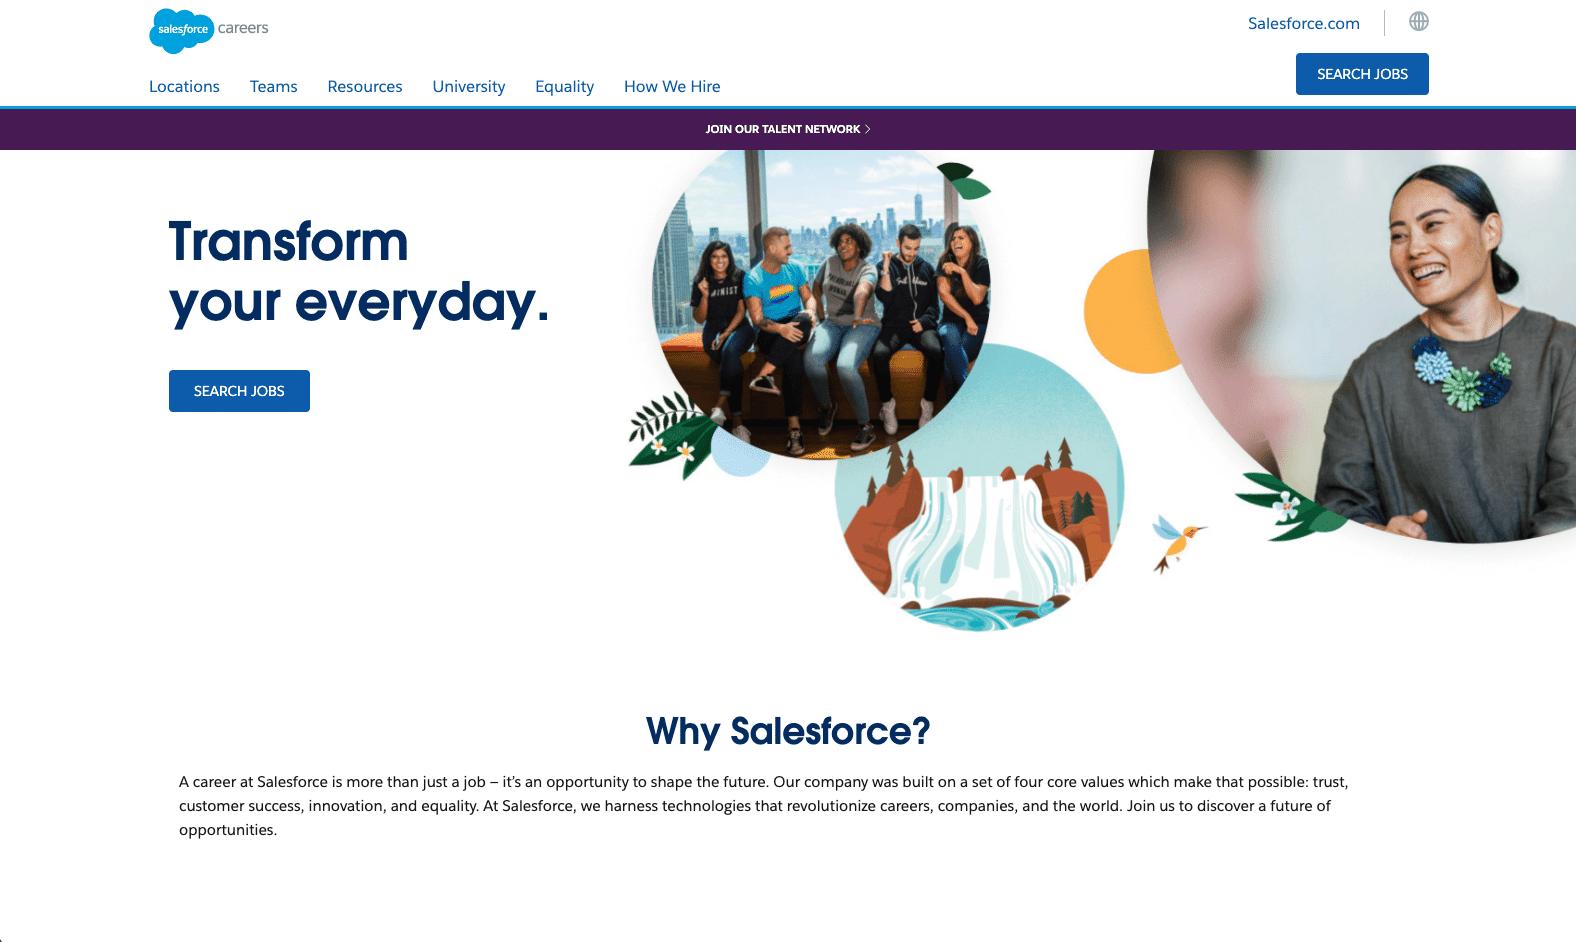 Screenshot of salesforce careers page